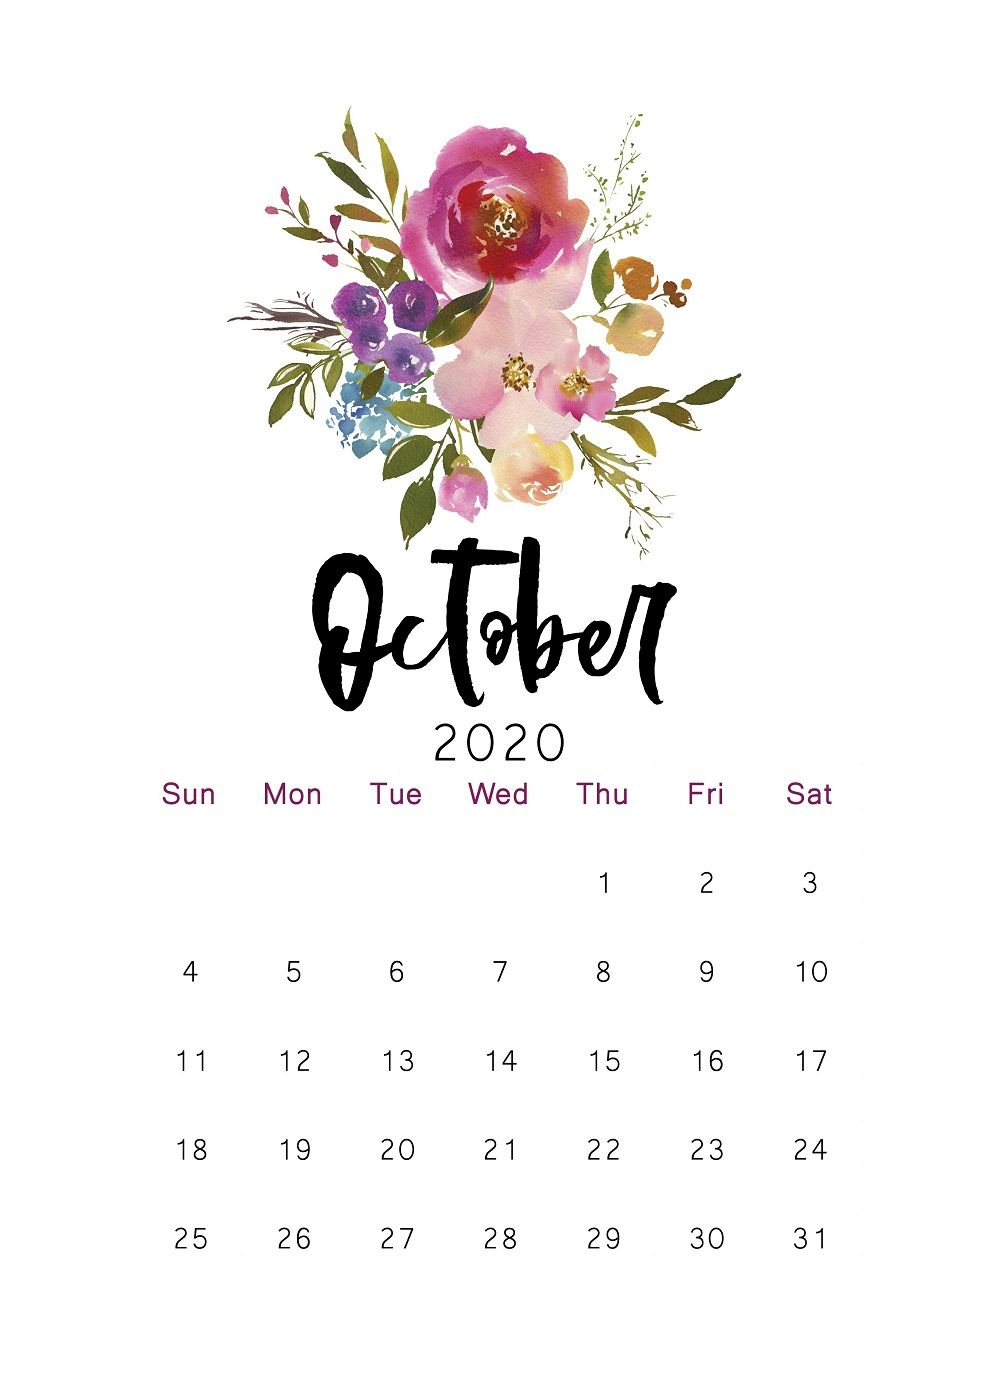 2020 Printable Calendar Floral Watercolor Calendar Letter Etsy In 2020 Calendar Wallpaper Hello October Images Lettering